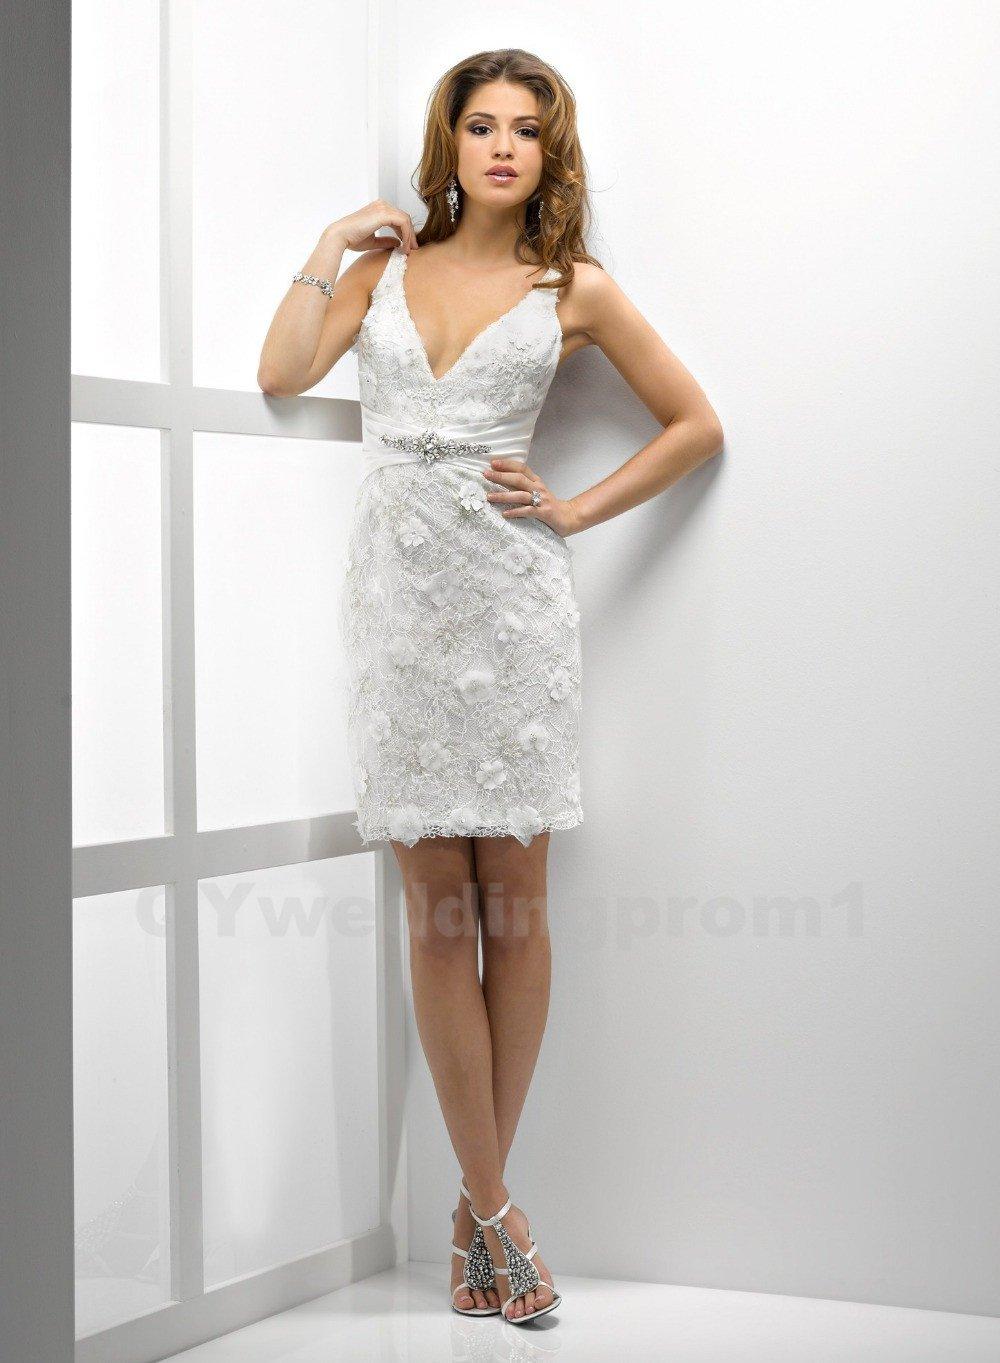 Lace A-Line Wedding Dress Fashionable Beaded Spaghetti Straps White Cheap Short Wedding Dress